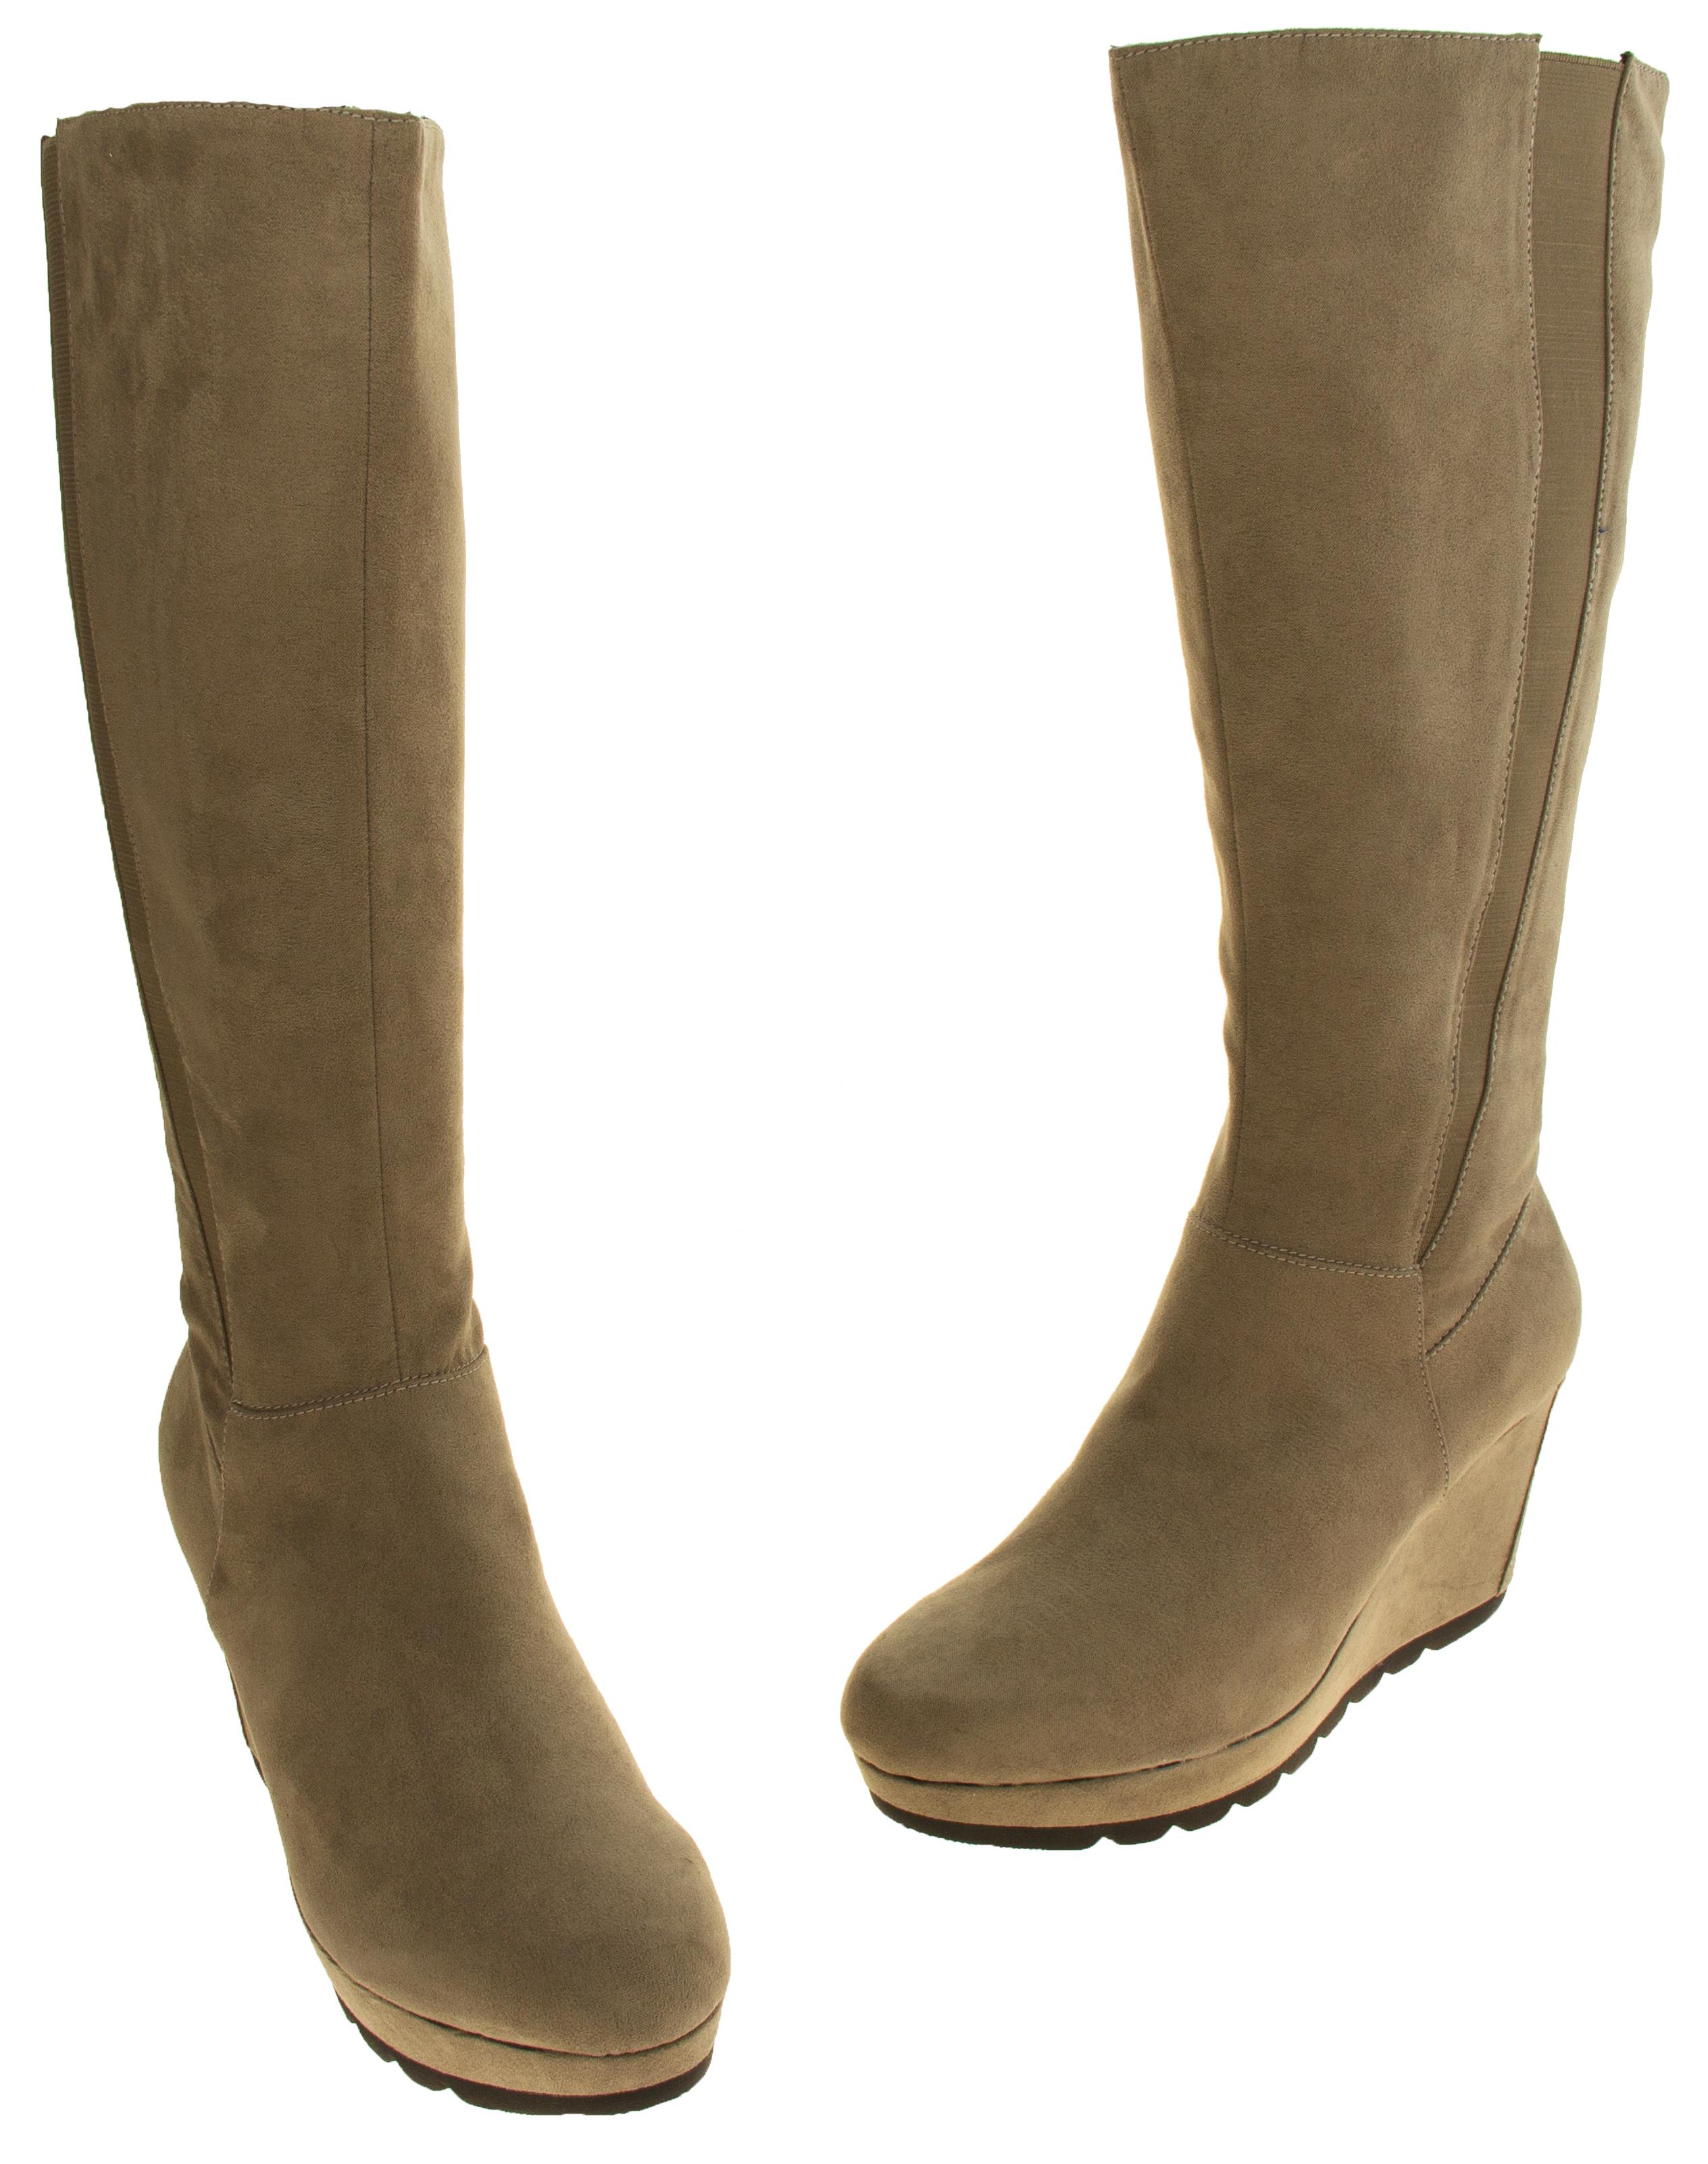 85ab59c929d Sentinel Ladies S.Oliver Beige Faux Suede Knee High Boots Platform Wedge  Heel Size 4 6. Sentinel Thumbnail 7